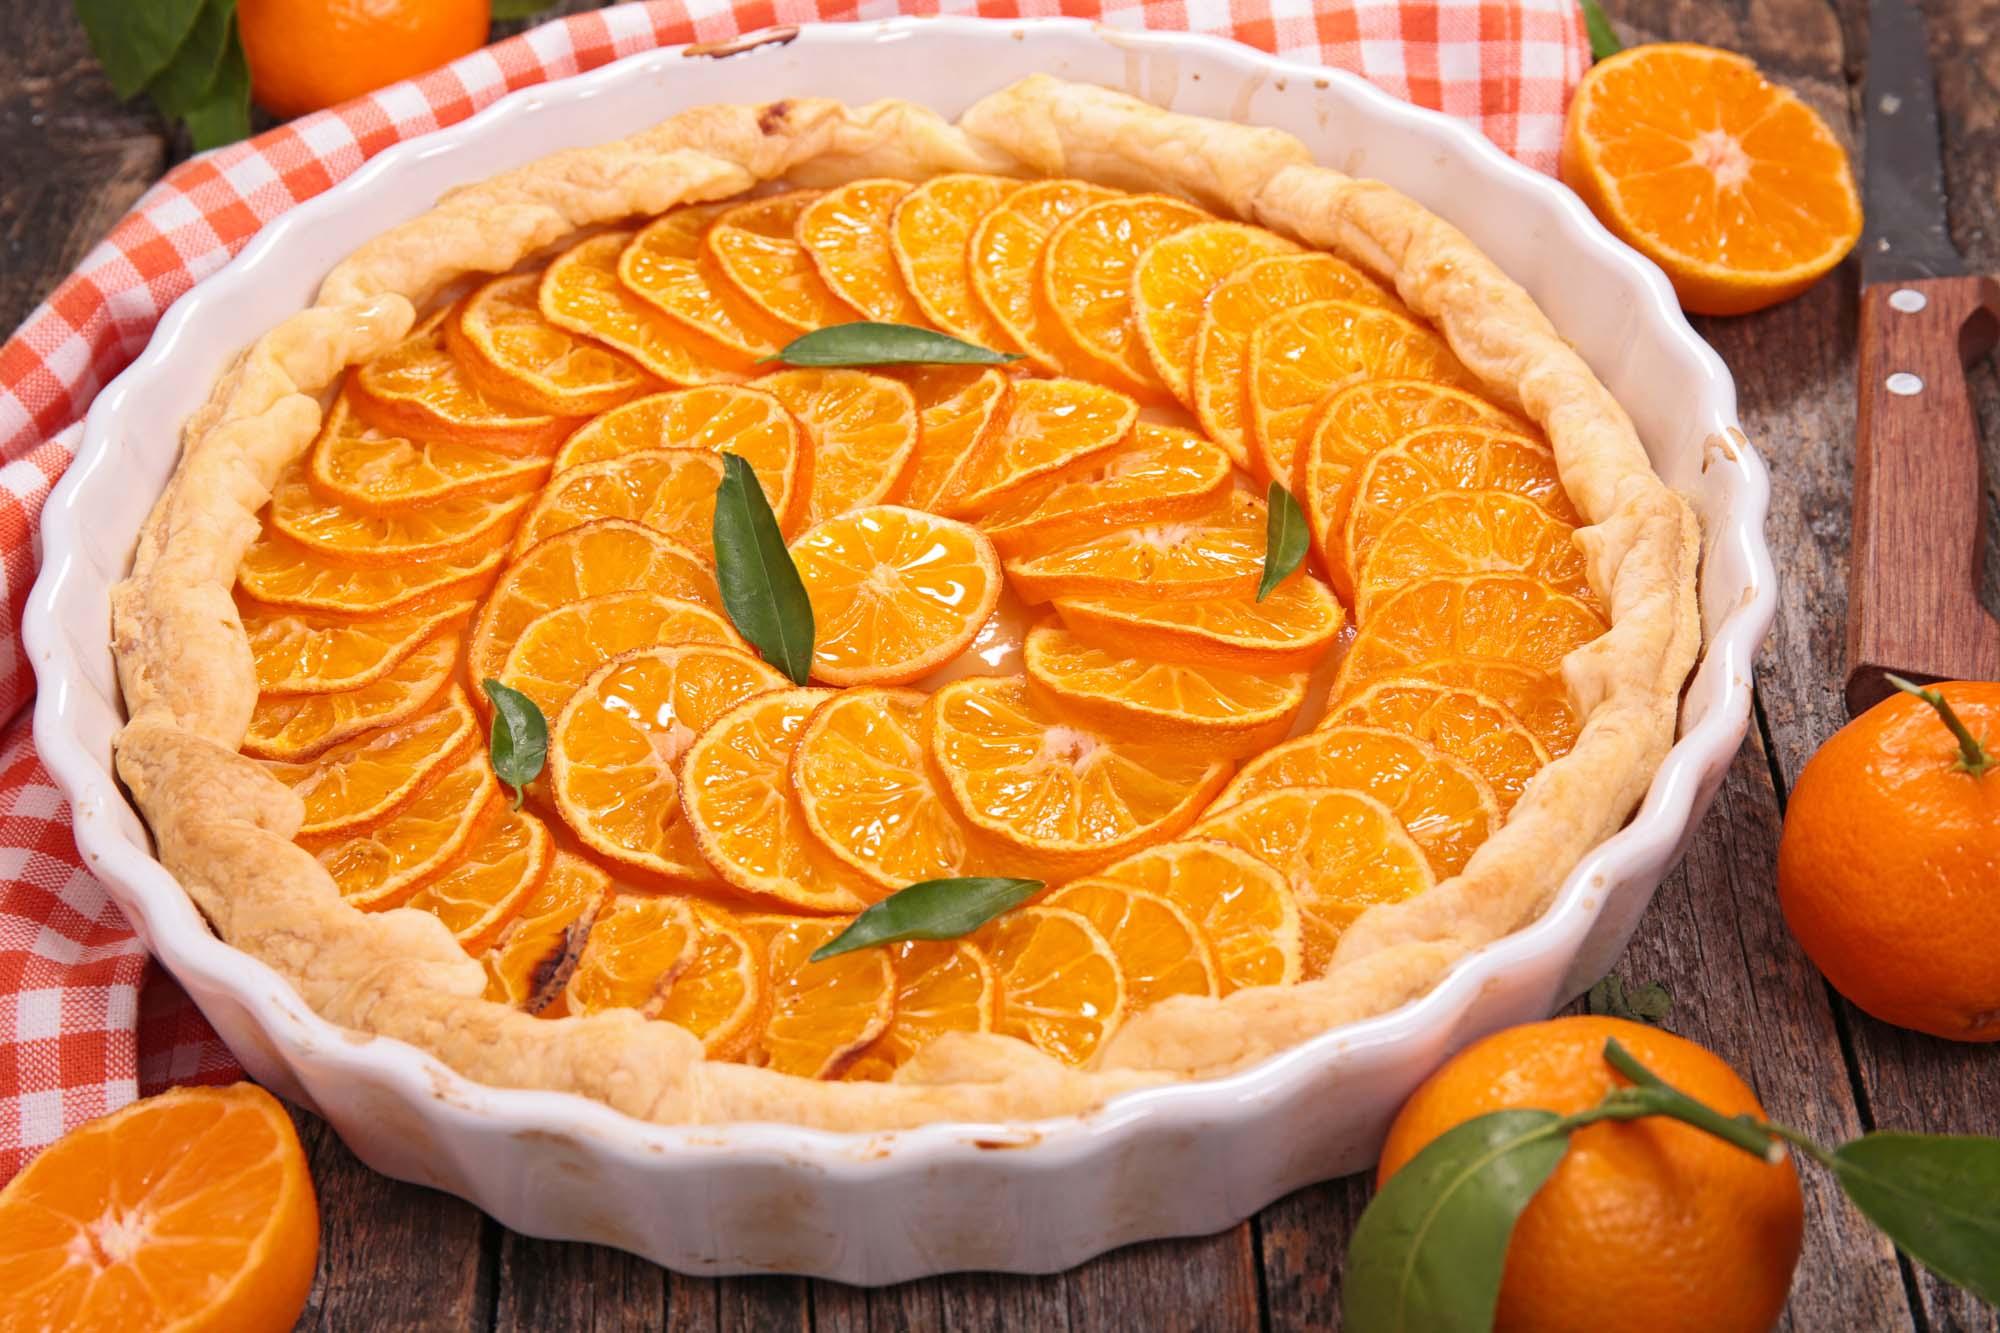 Appelsin-hindbær tærte